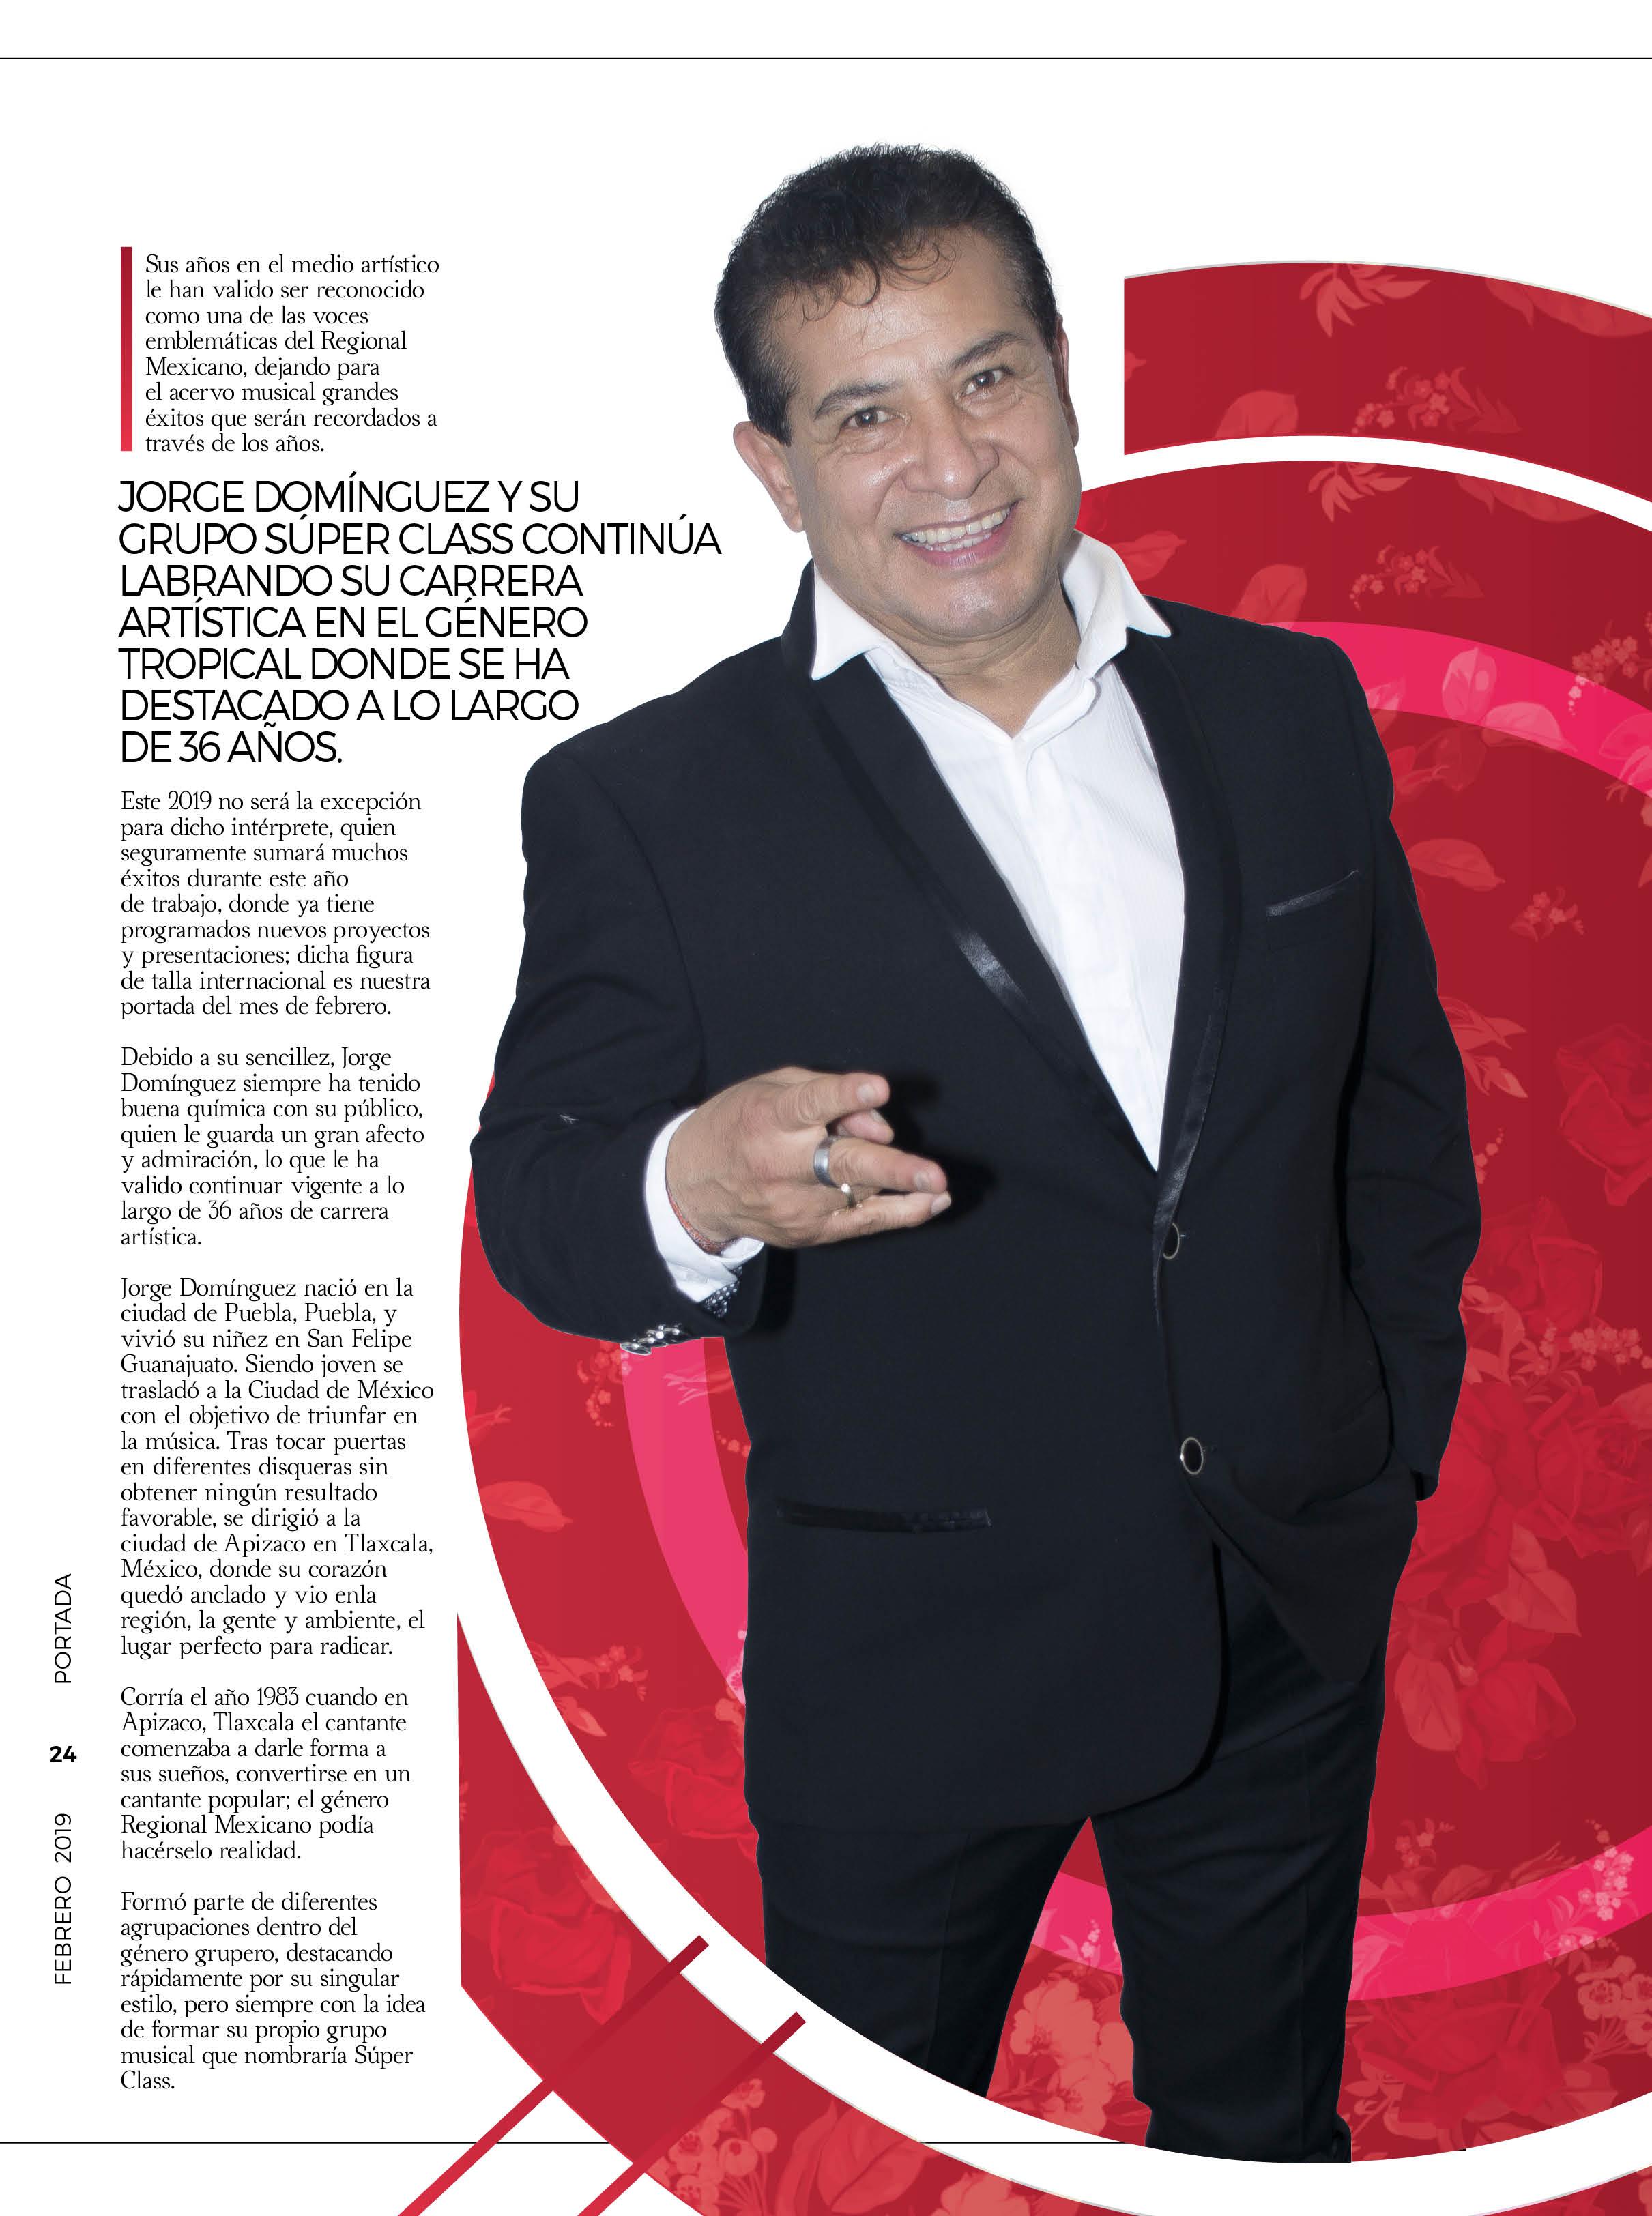 Jorge Domínguez